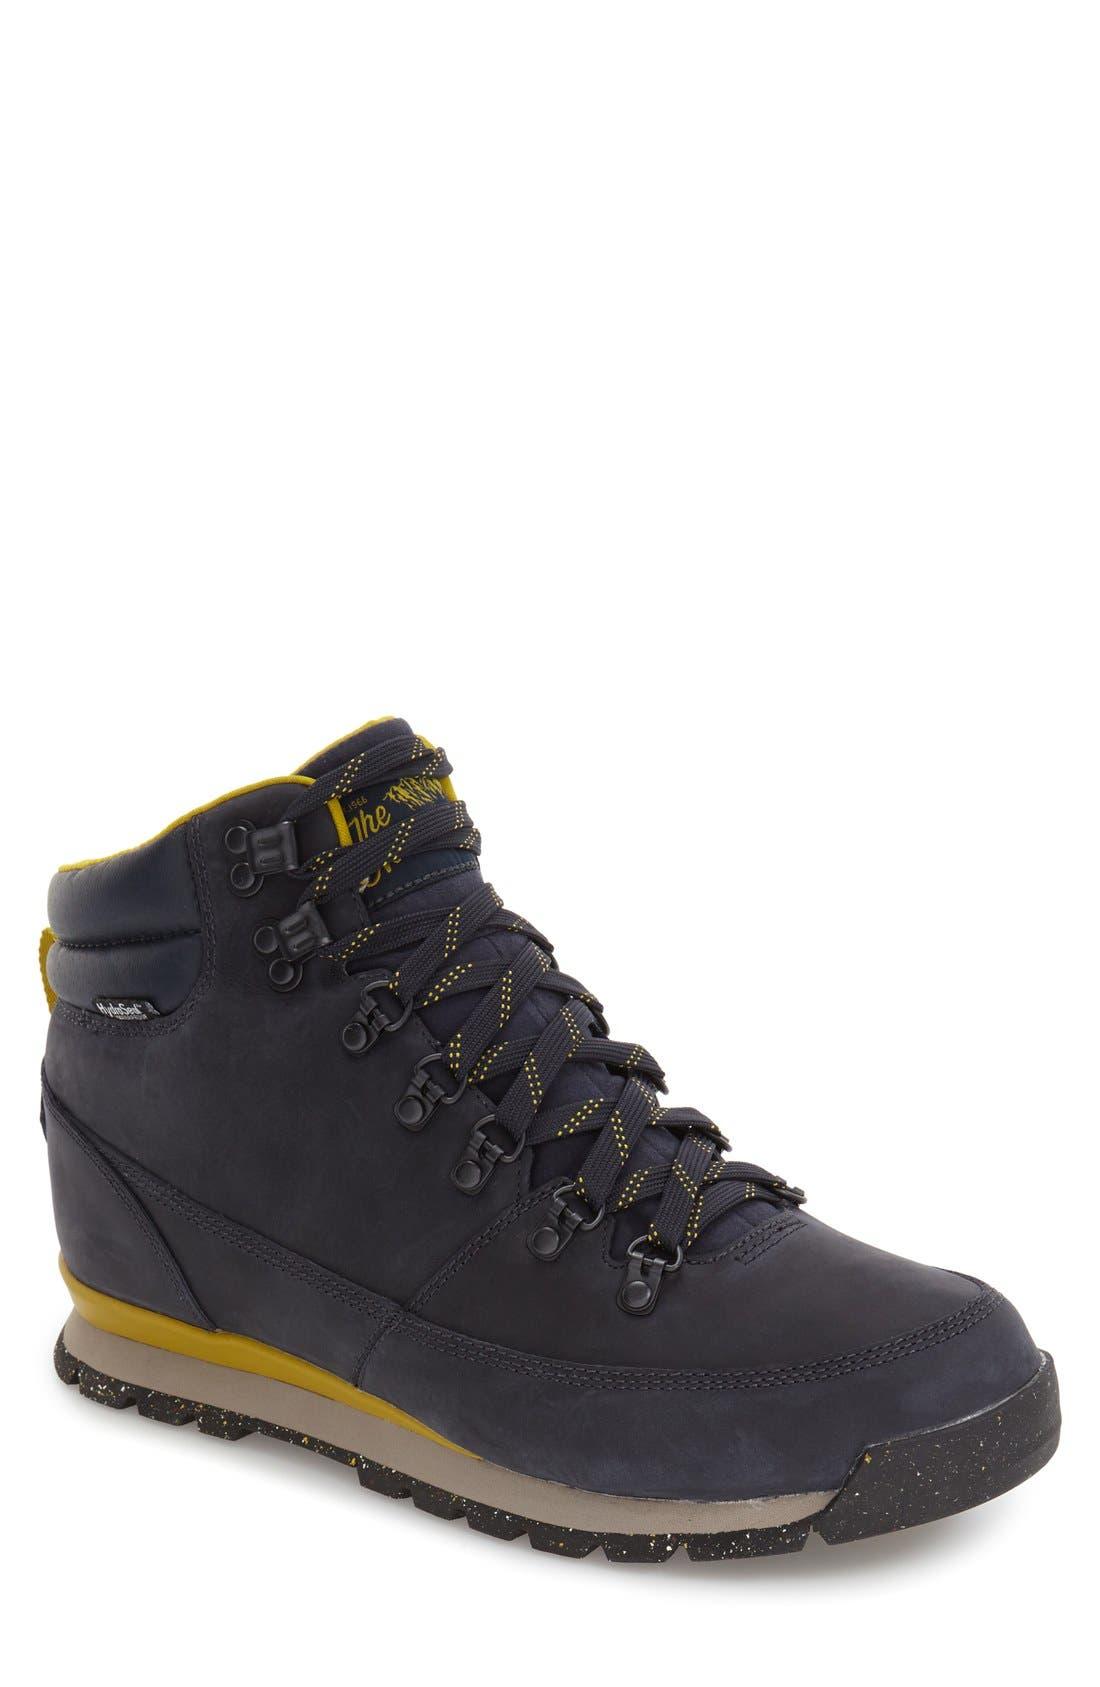 Alternate Image 1 Selected - The North Face 'Back to Berkeley Redux' Waterproof Boot (Men)